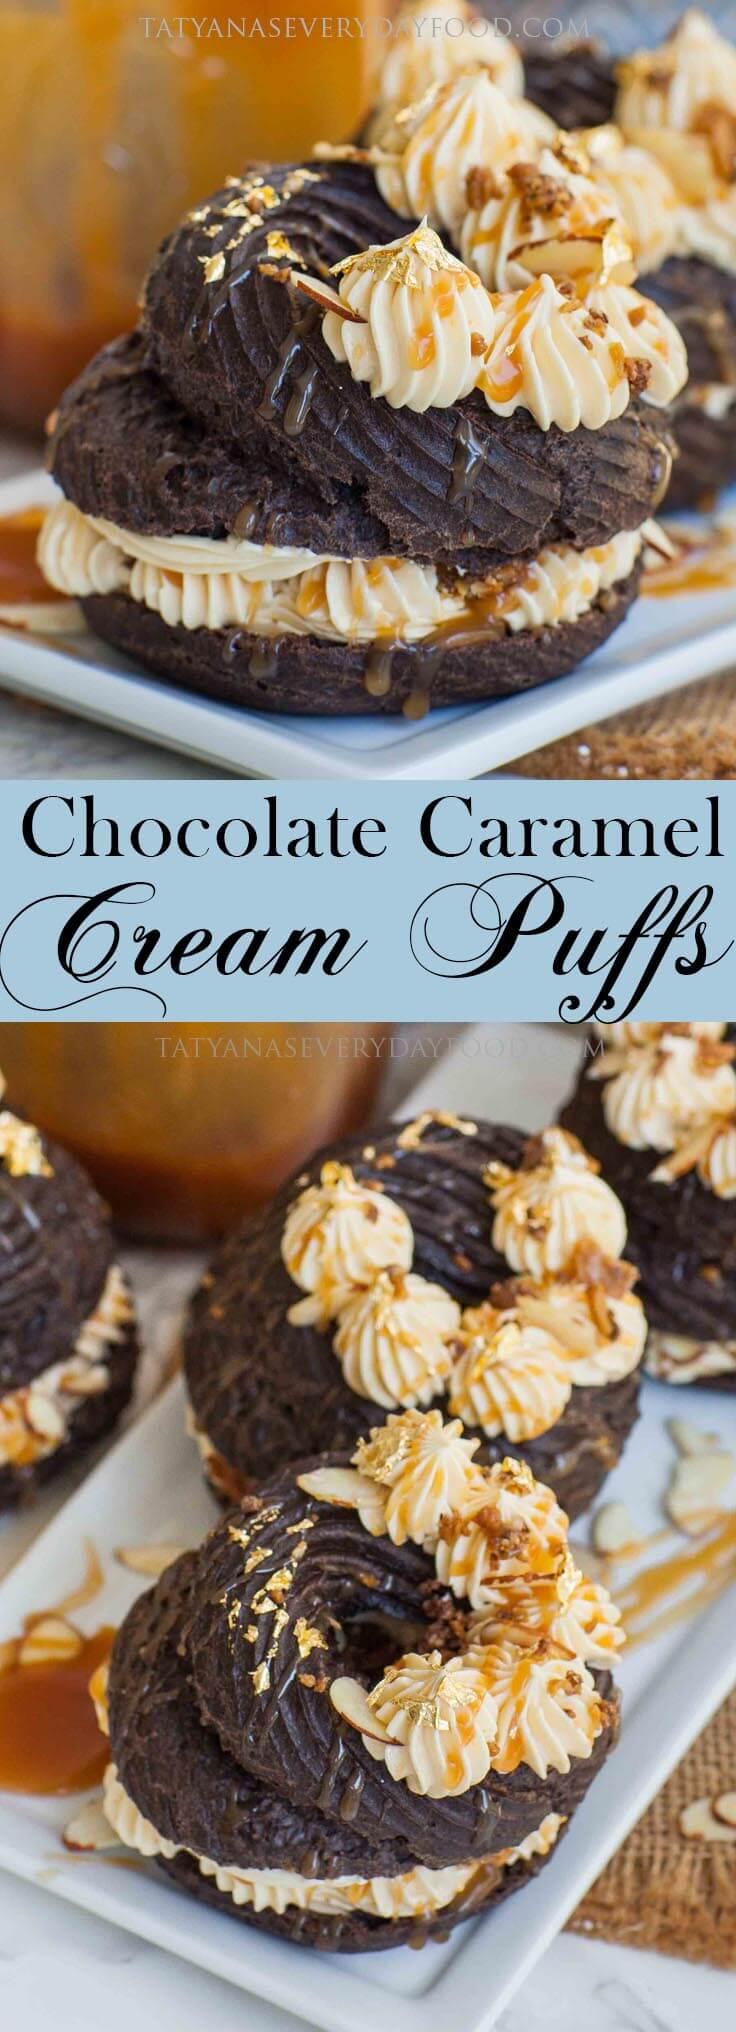 Fancy Caramel Chocolate Cream Puffs recipe with caramel filling